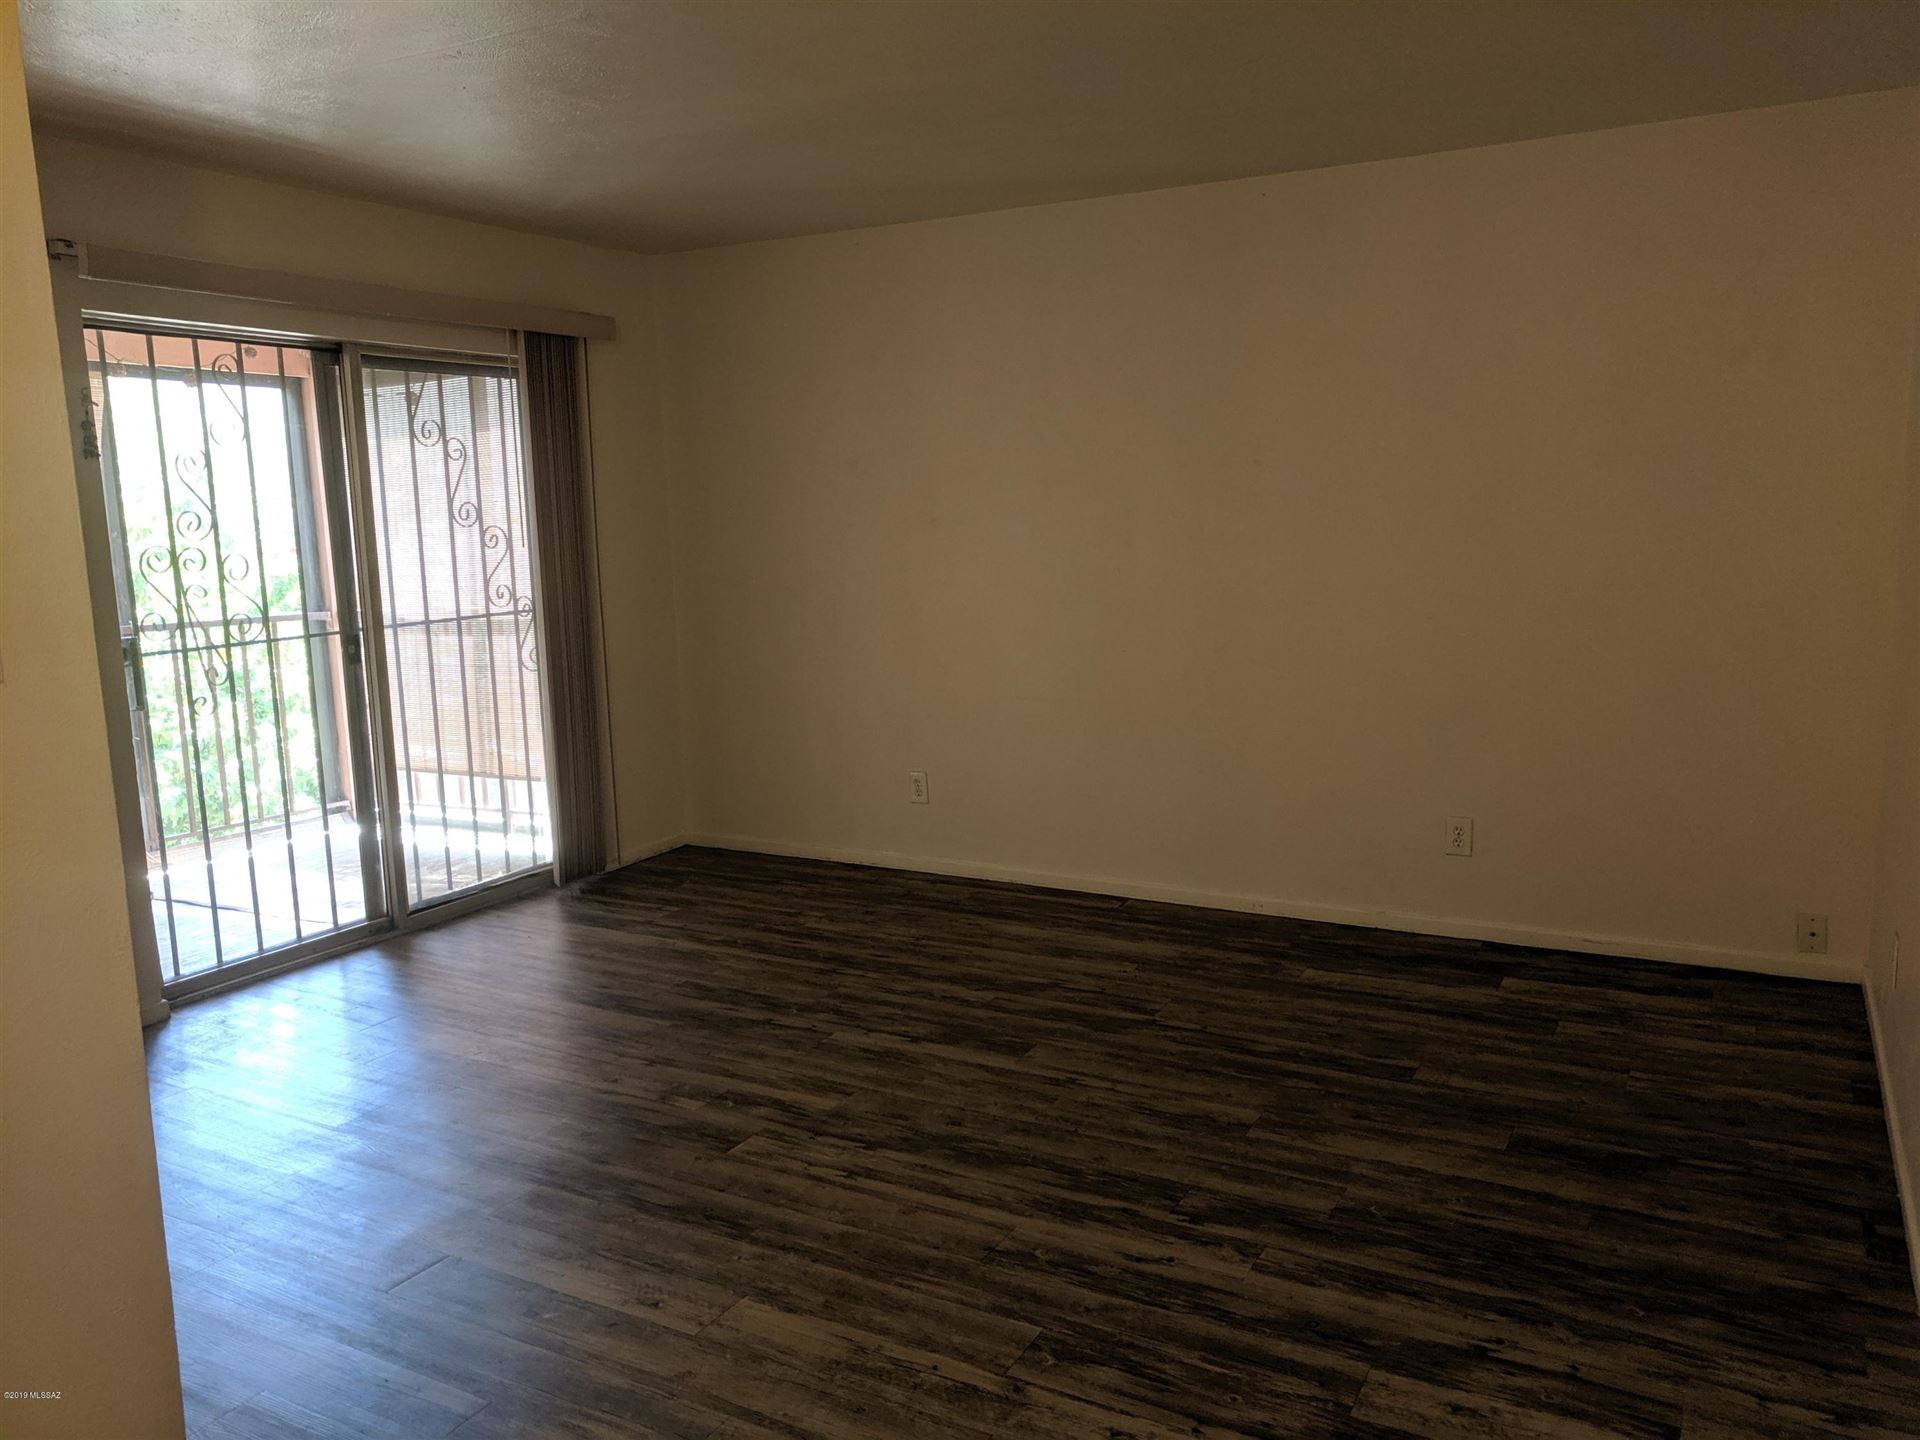 1600 N Wilmot Road #251, Tucson, AZ 85712 - #: 22100488